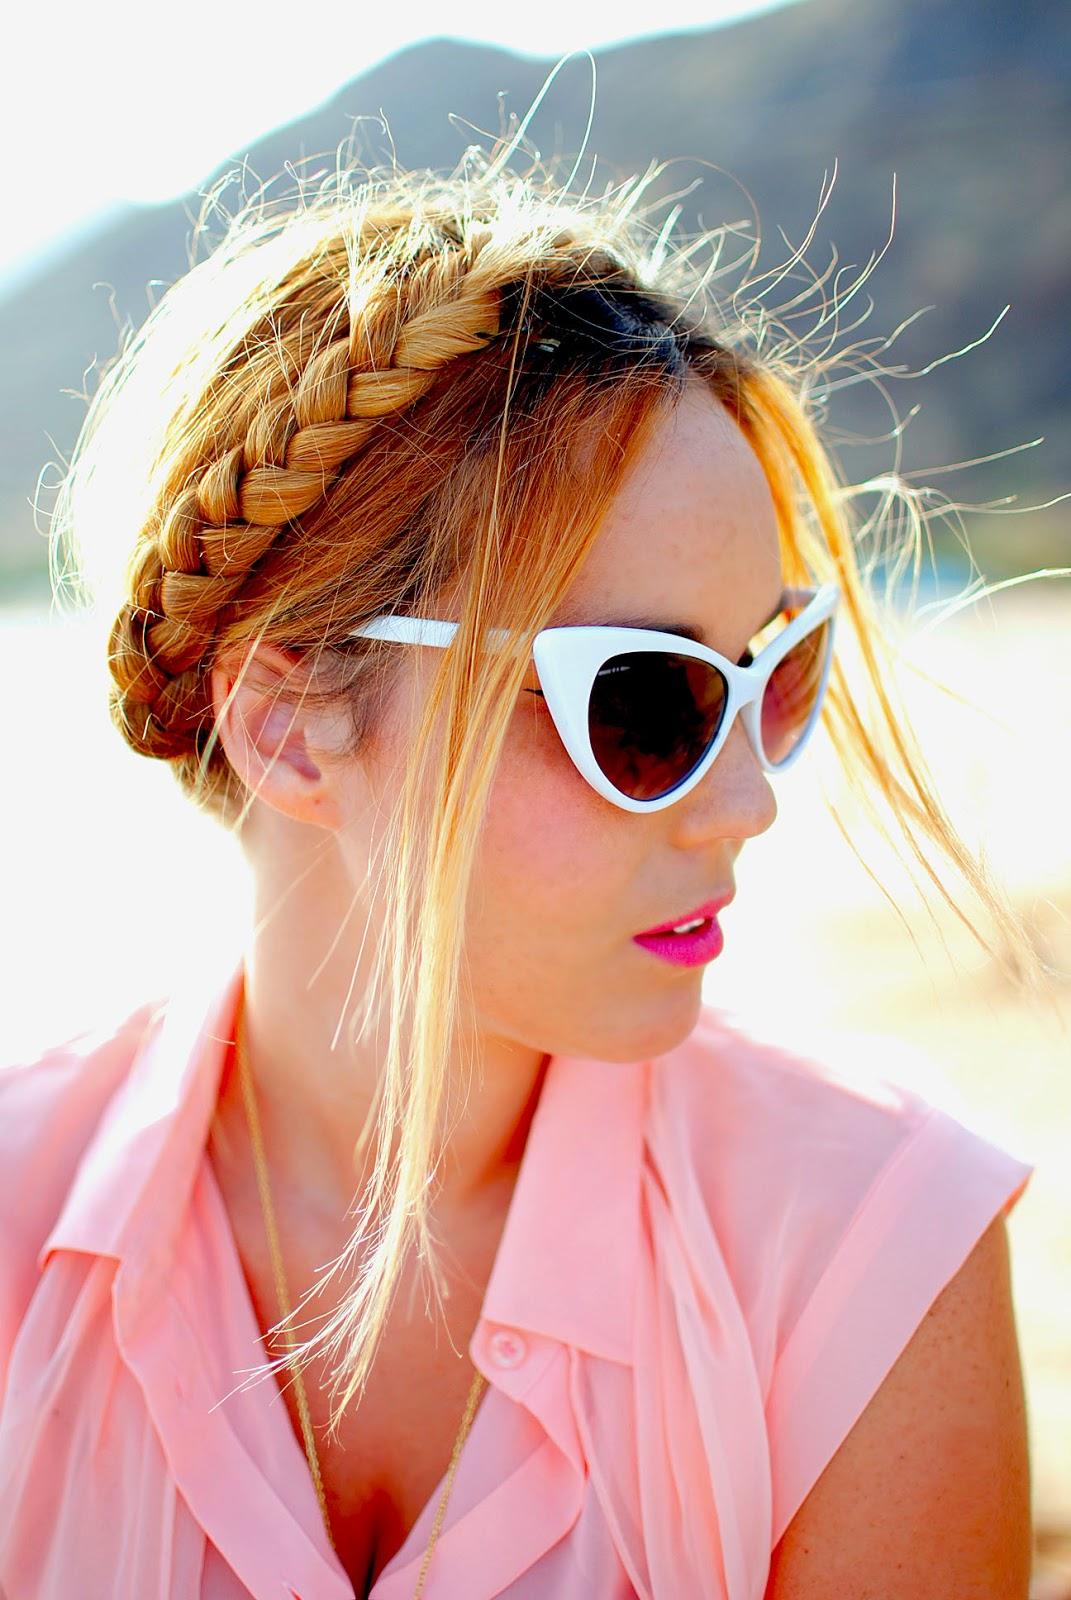 ney hdez, espadrilles, cherry print, hairstyle, braid, nowistyle, trenza, zerouv